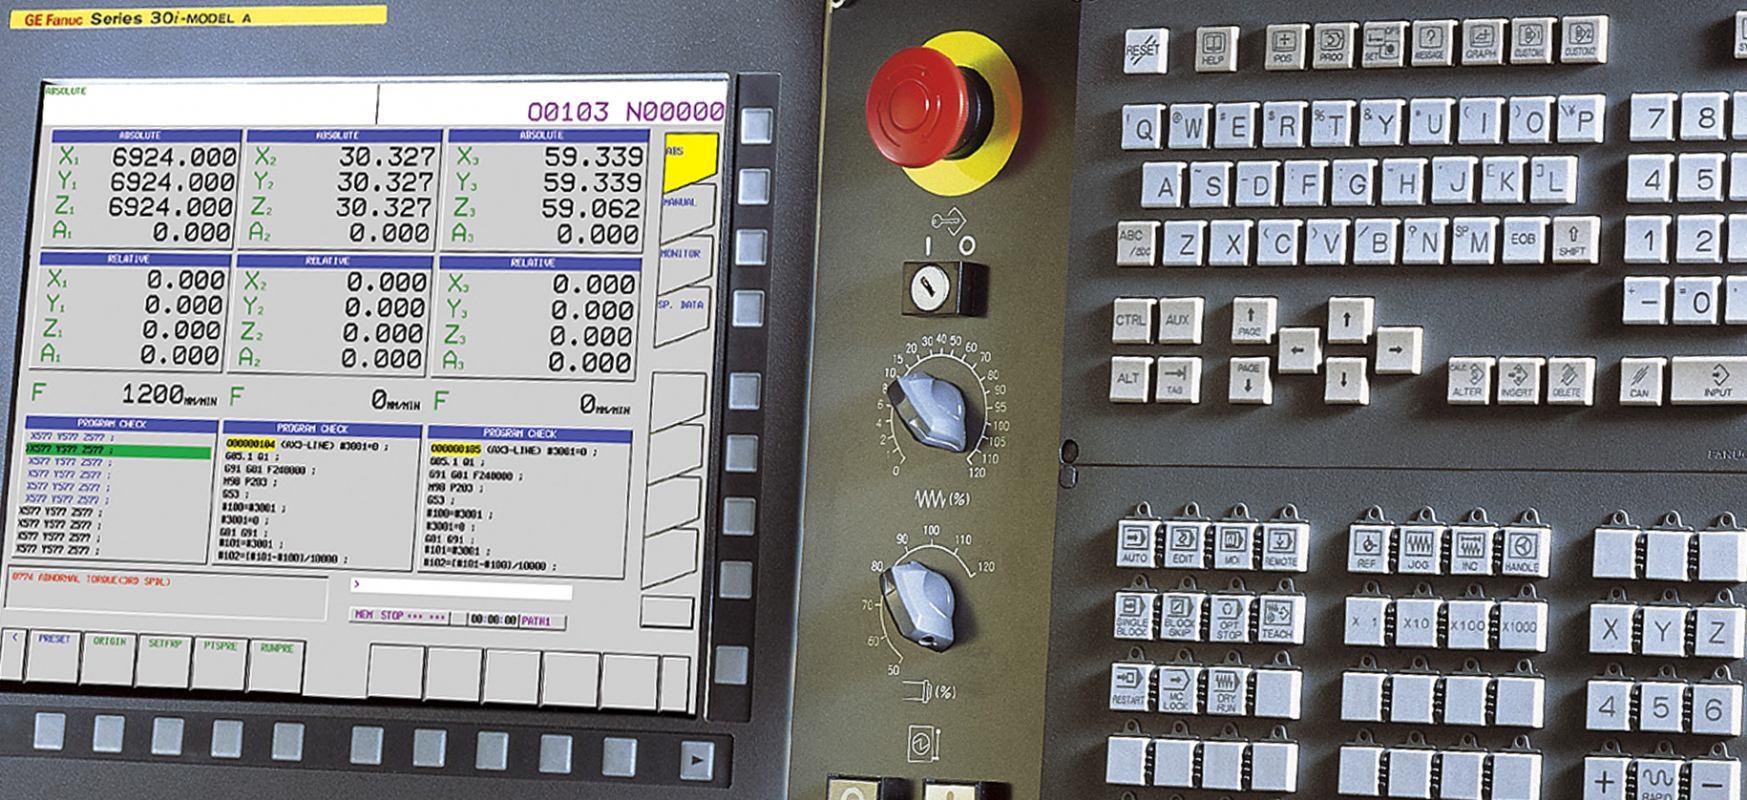 Machine Maintenance and Representation